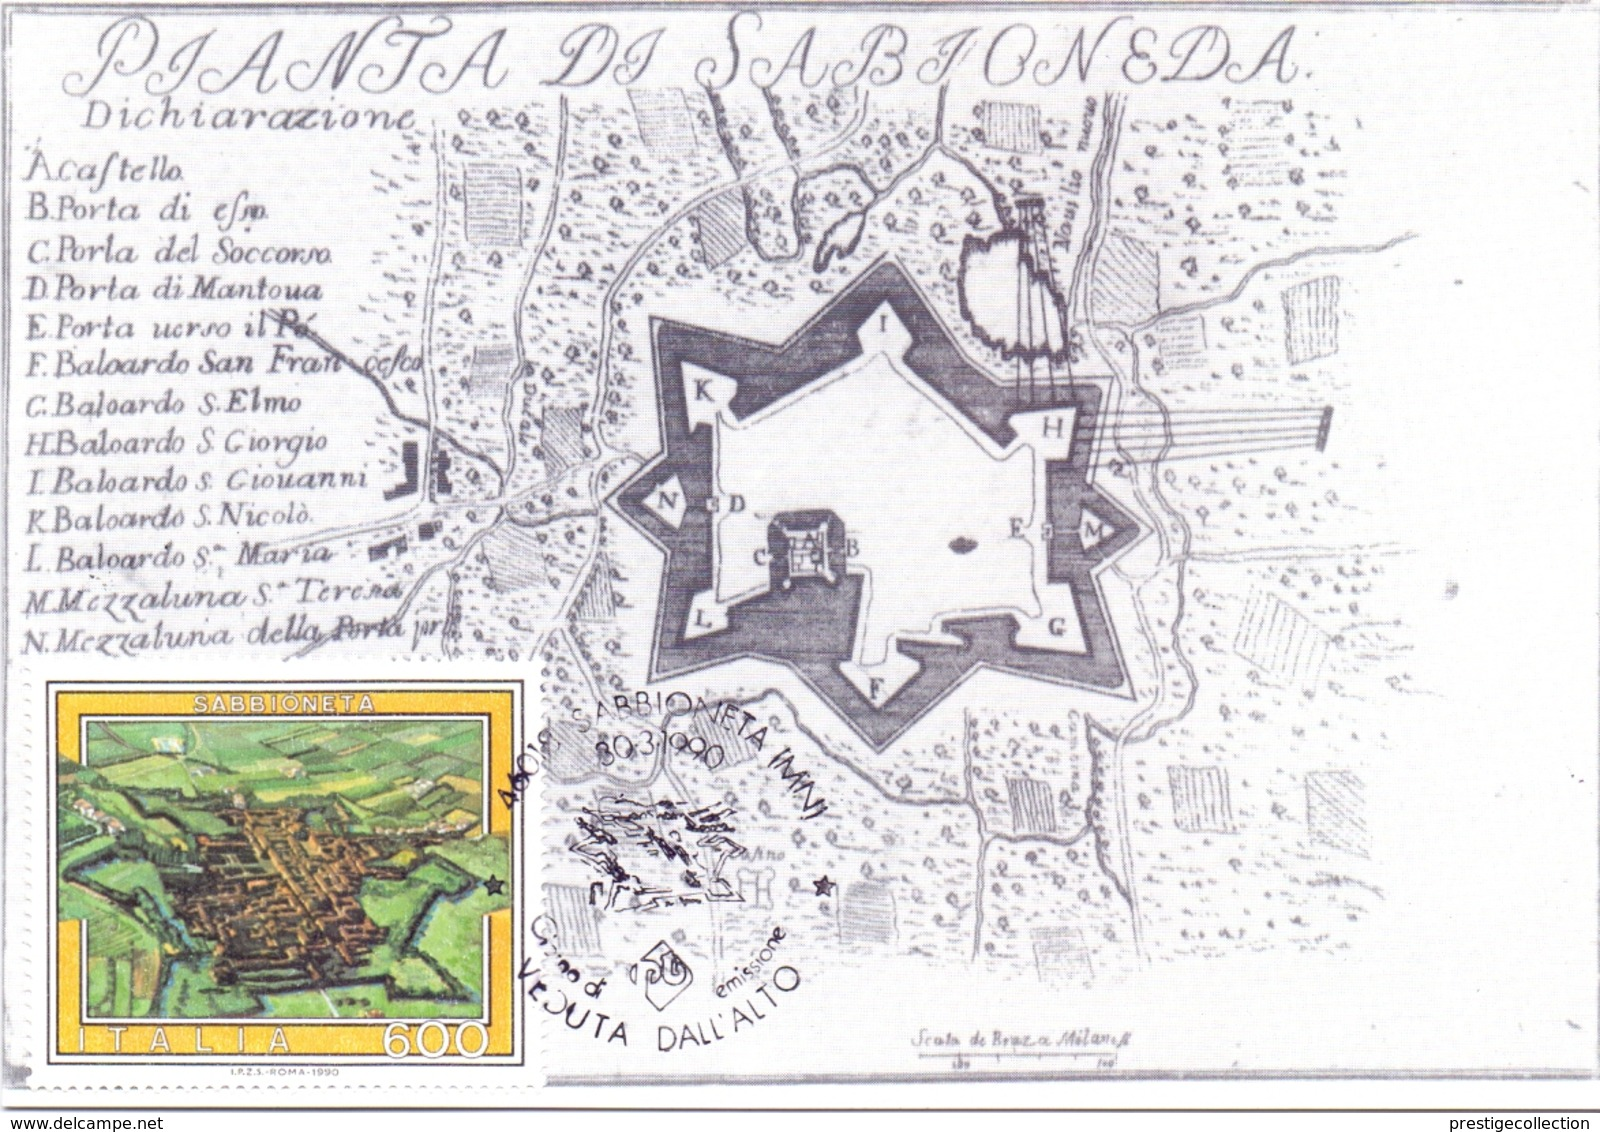 MAPPA DI SABBIONETTA PIAZZE E CASTELLI FORTIFICATI  1990 MAXIMUM POST CARD (GENN200355) - Maximumkarten (MC)